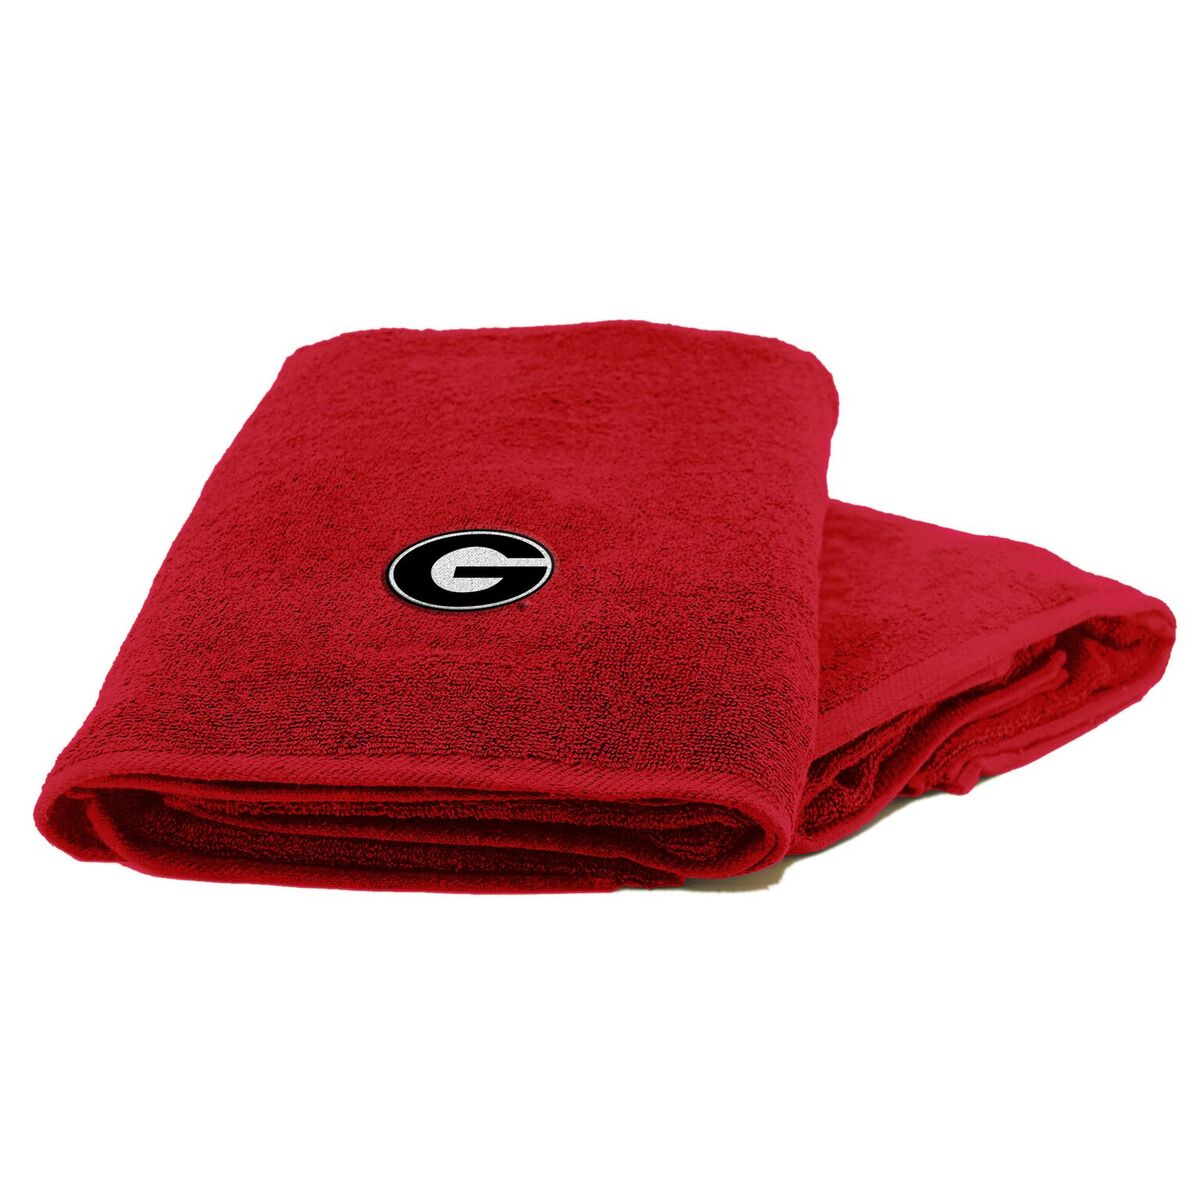 Georgia Bulldogs 2-Piece Towel Set, With 26x15 Hand and 25x50 Bath Towel